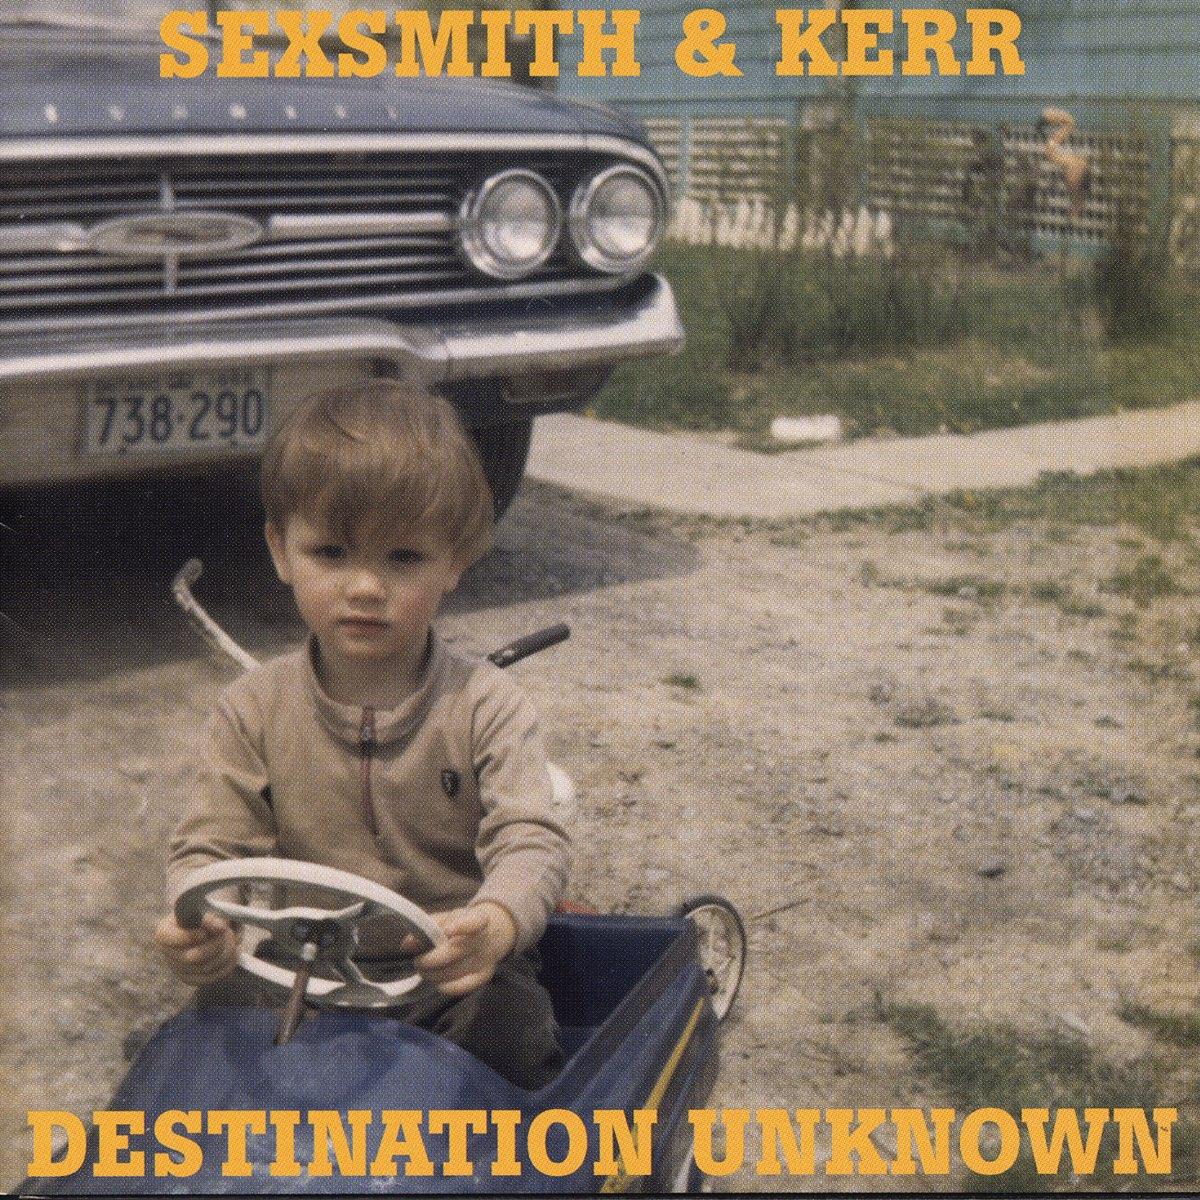 Sexsmith & Kerr, Destination Unknown